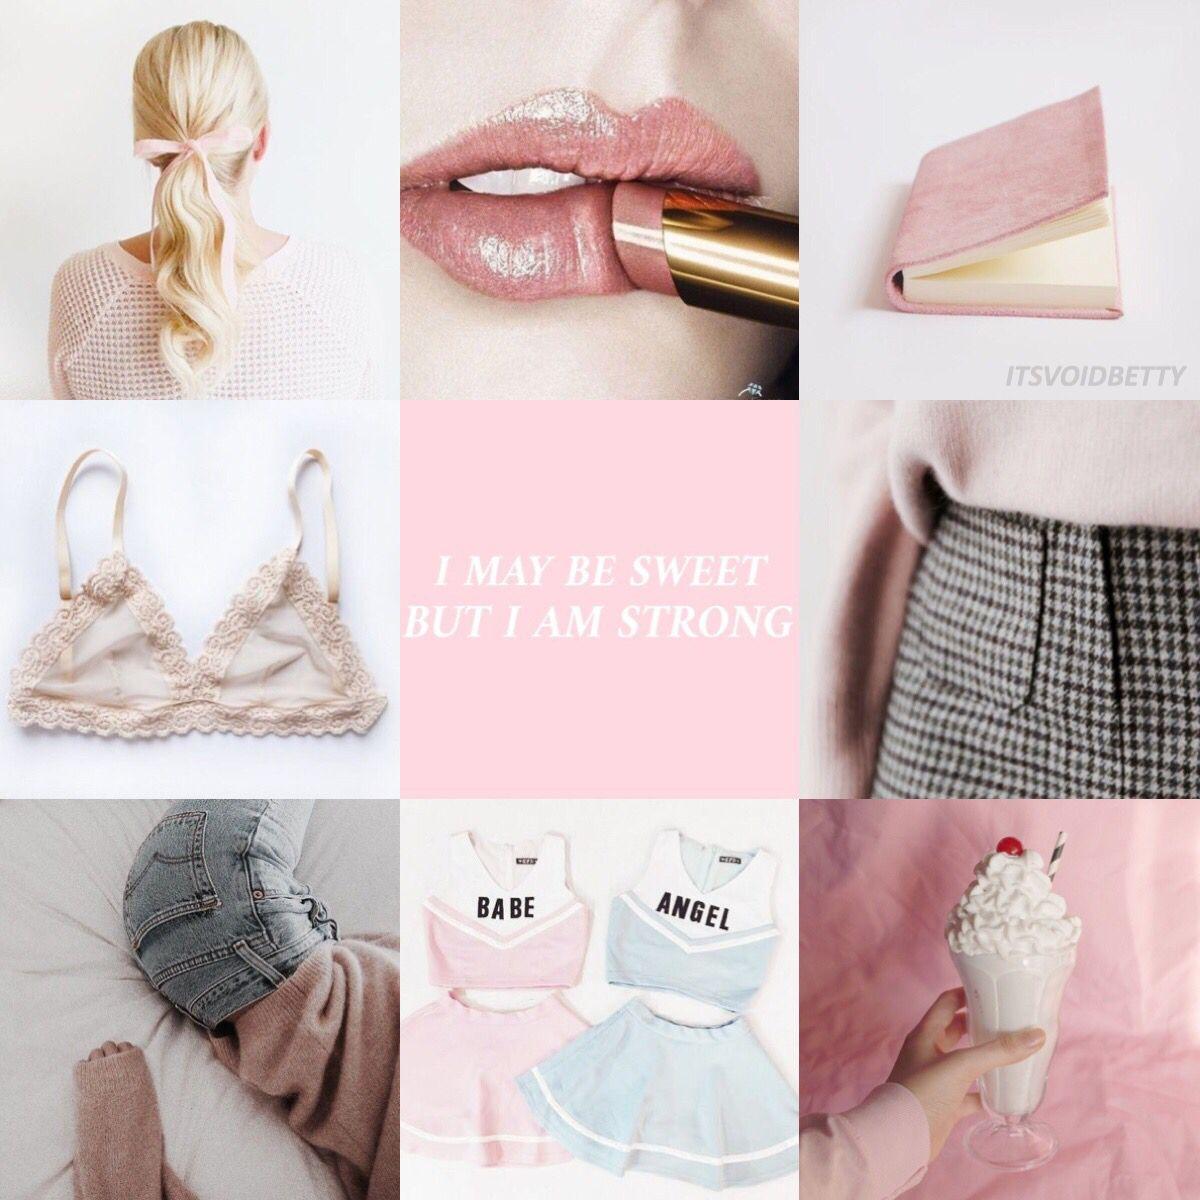 Betty Cooper Riverdale Bettycooper Aesthetic Pink White Betty Cooper Outfits Betty Cooper Aesthetic Betty Cooper